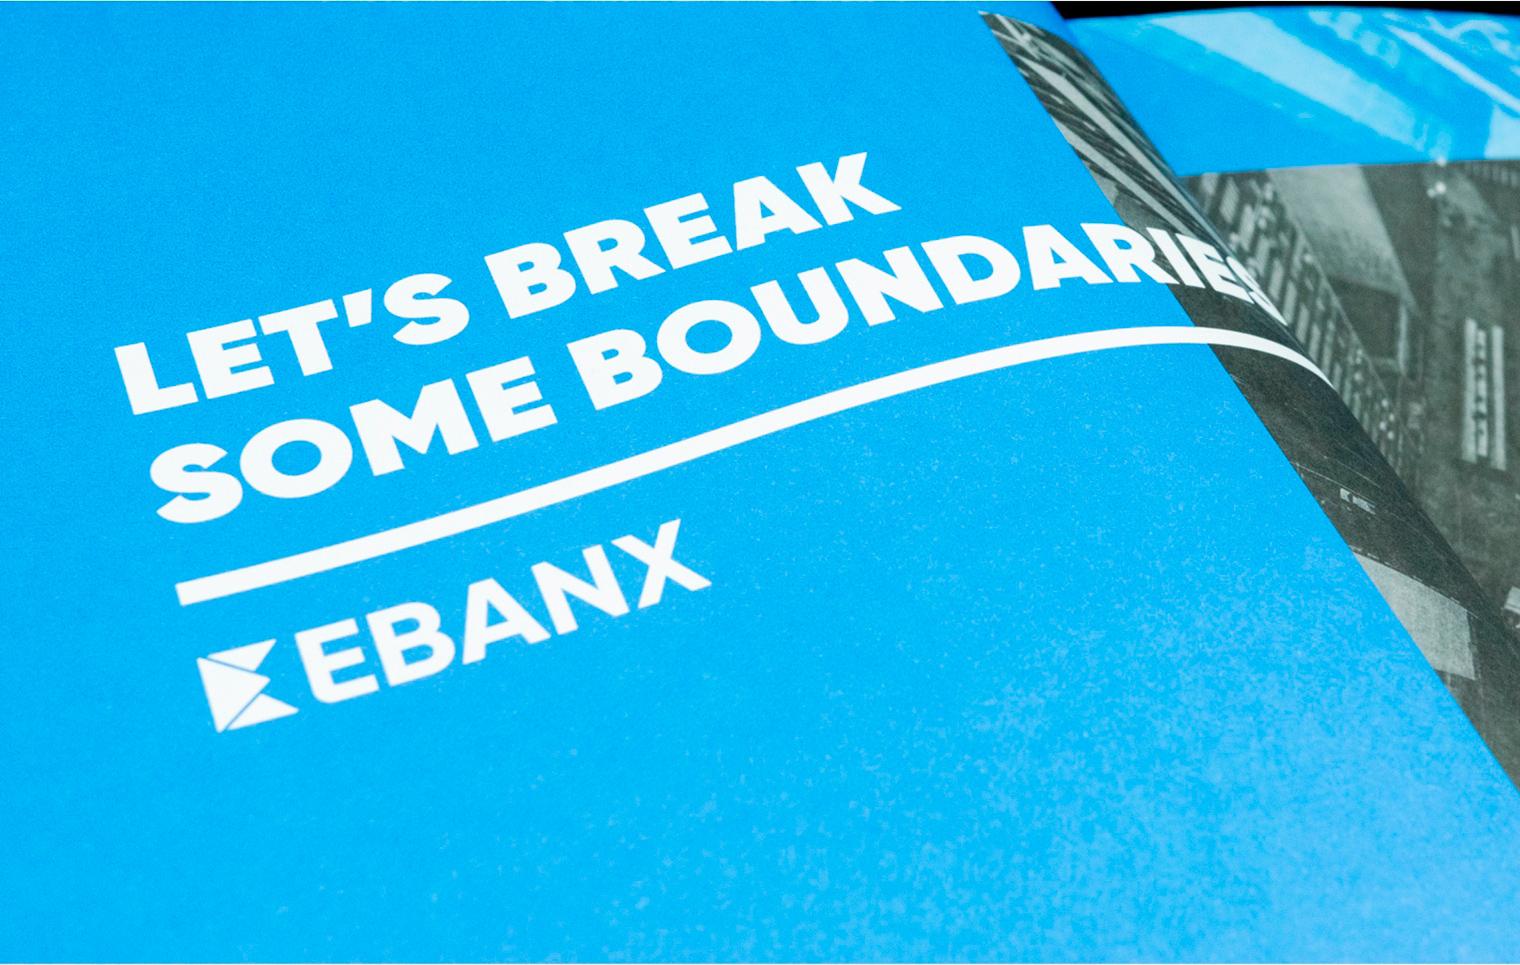 Let's break some boundaries | EBANX